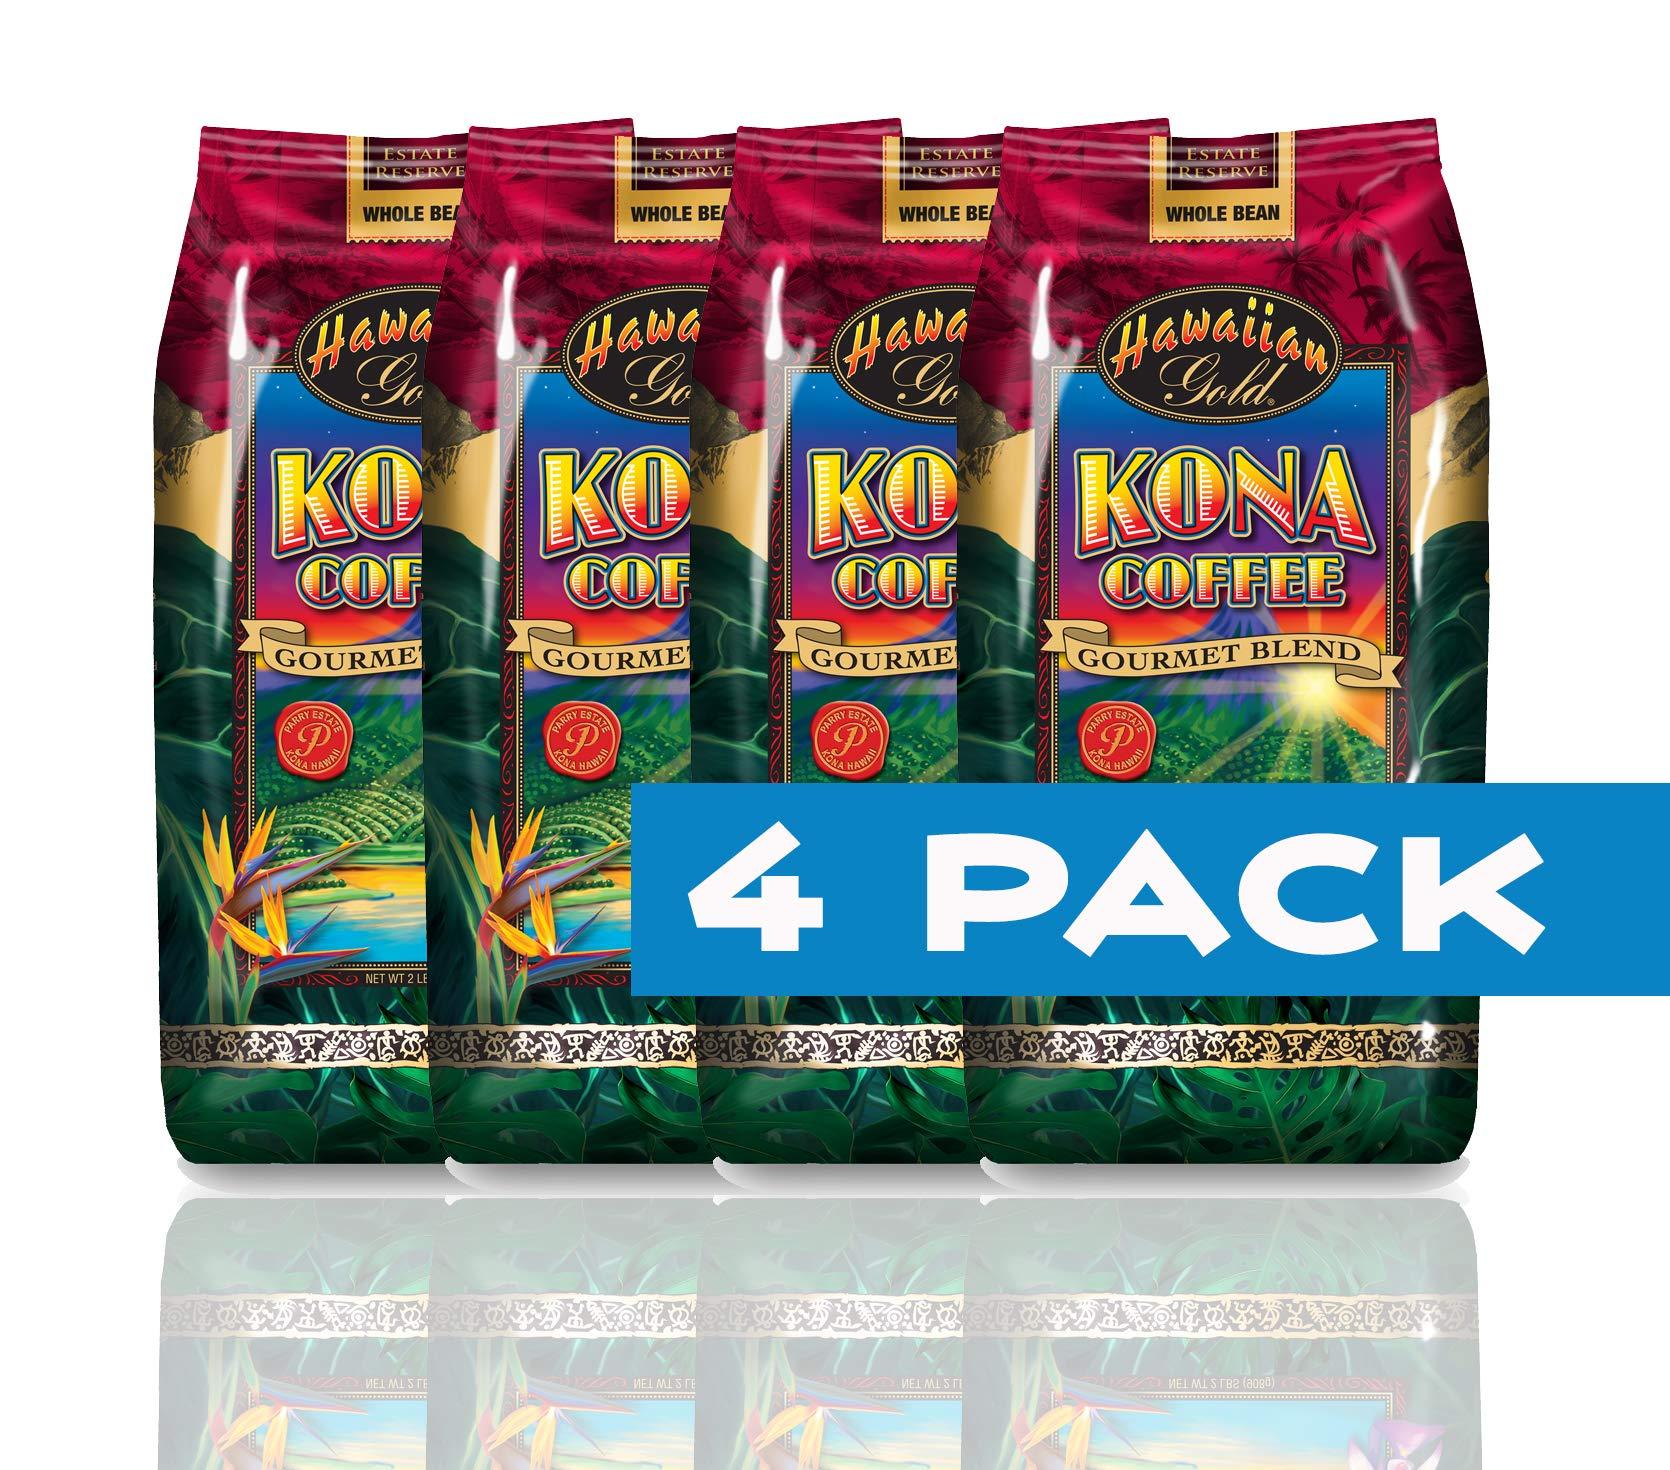 Hawallan Gold Kona Blend Coffee, 2 Pound … (Kona Gourmet Blend, 4 Bag) by Hawaiian Gold (Image #1)